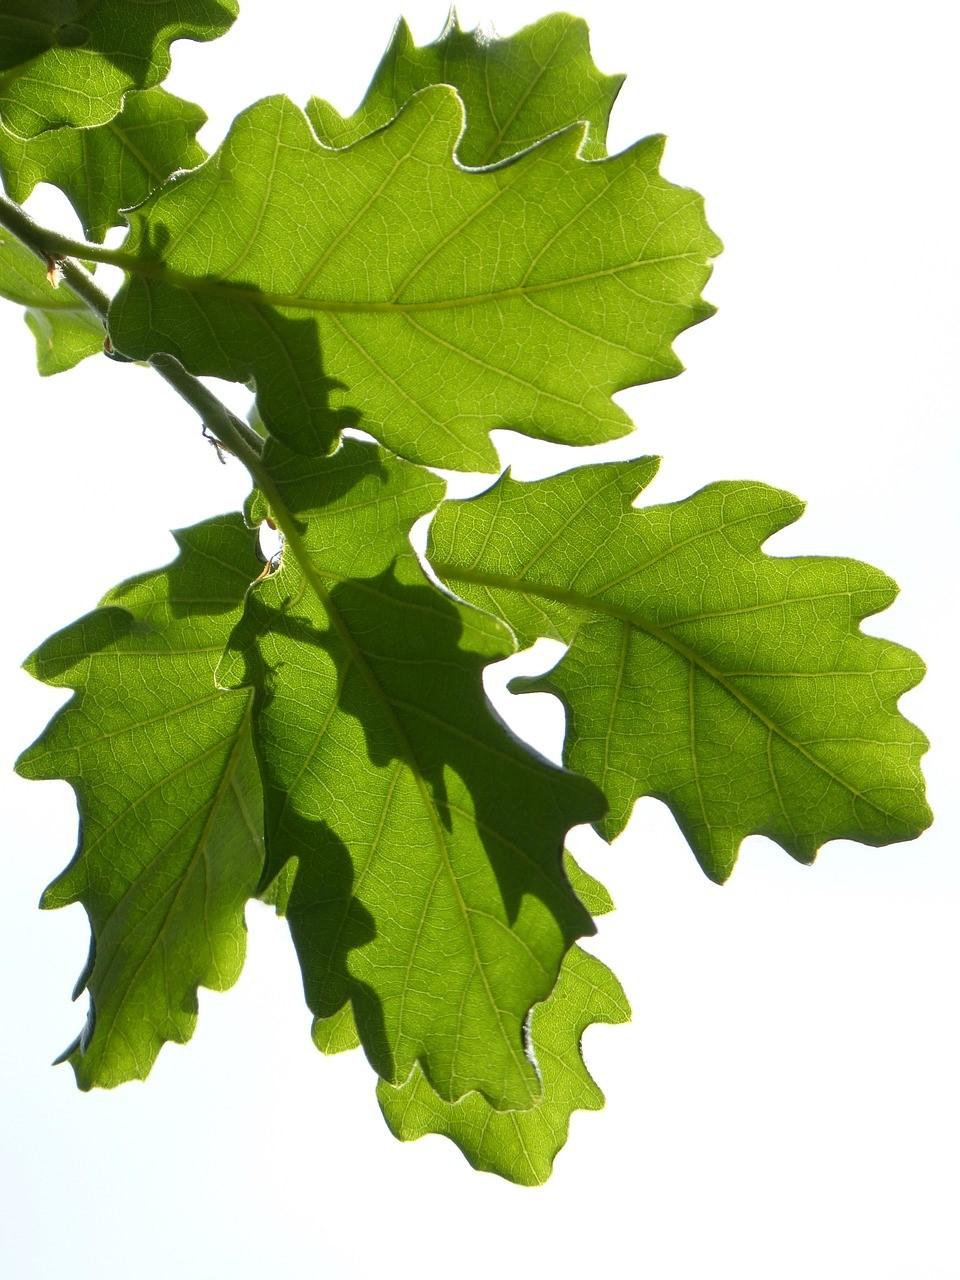 Leaves of Oak Trees